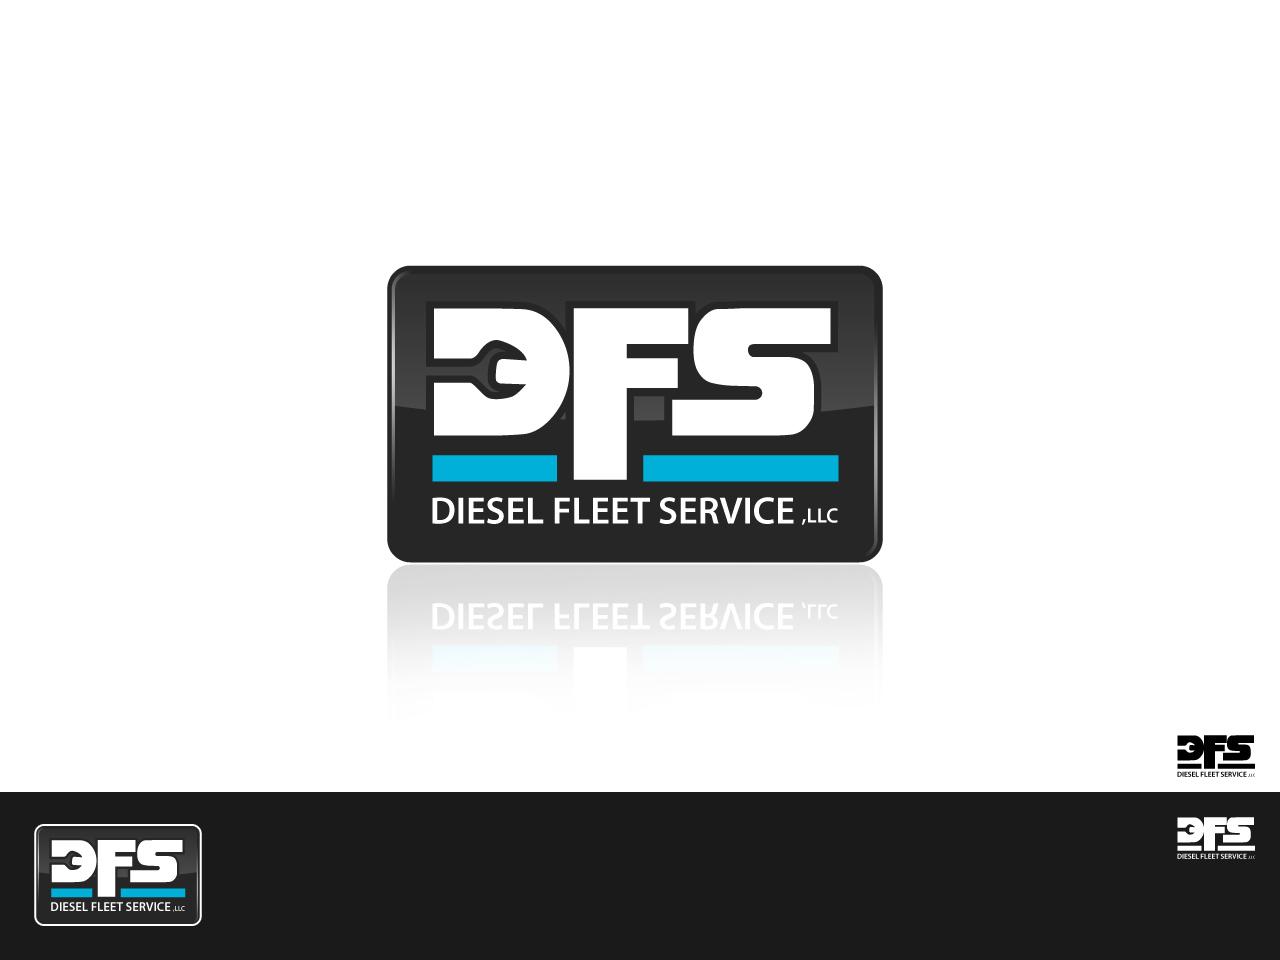 Logo Design by jpbituin - Entry No. 44 in the Logo Design Contest Artistic Logo Design for Diesel Fleet Service, LLC.